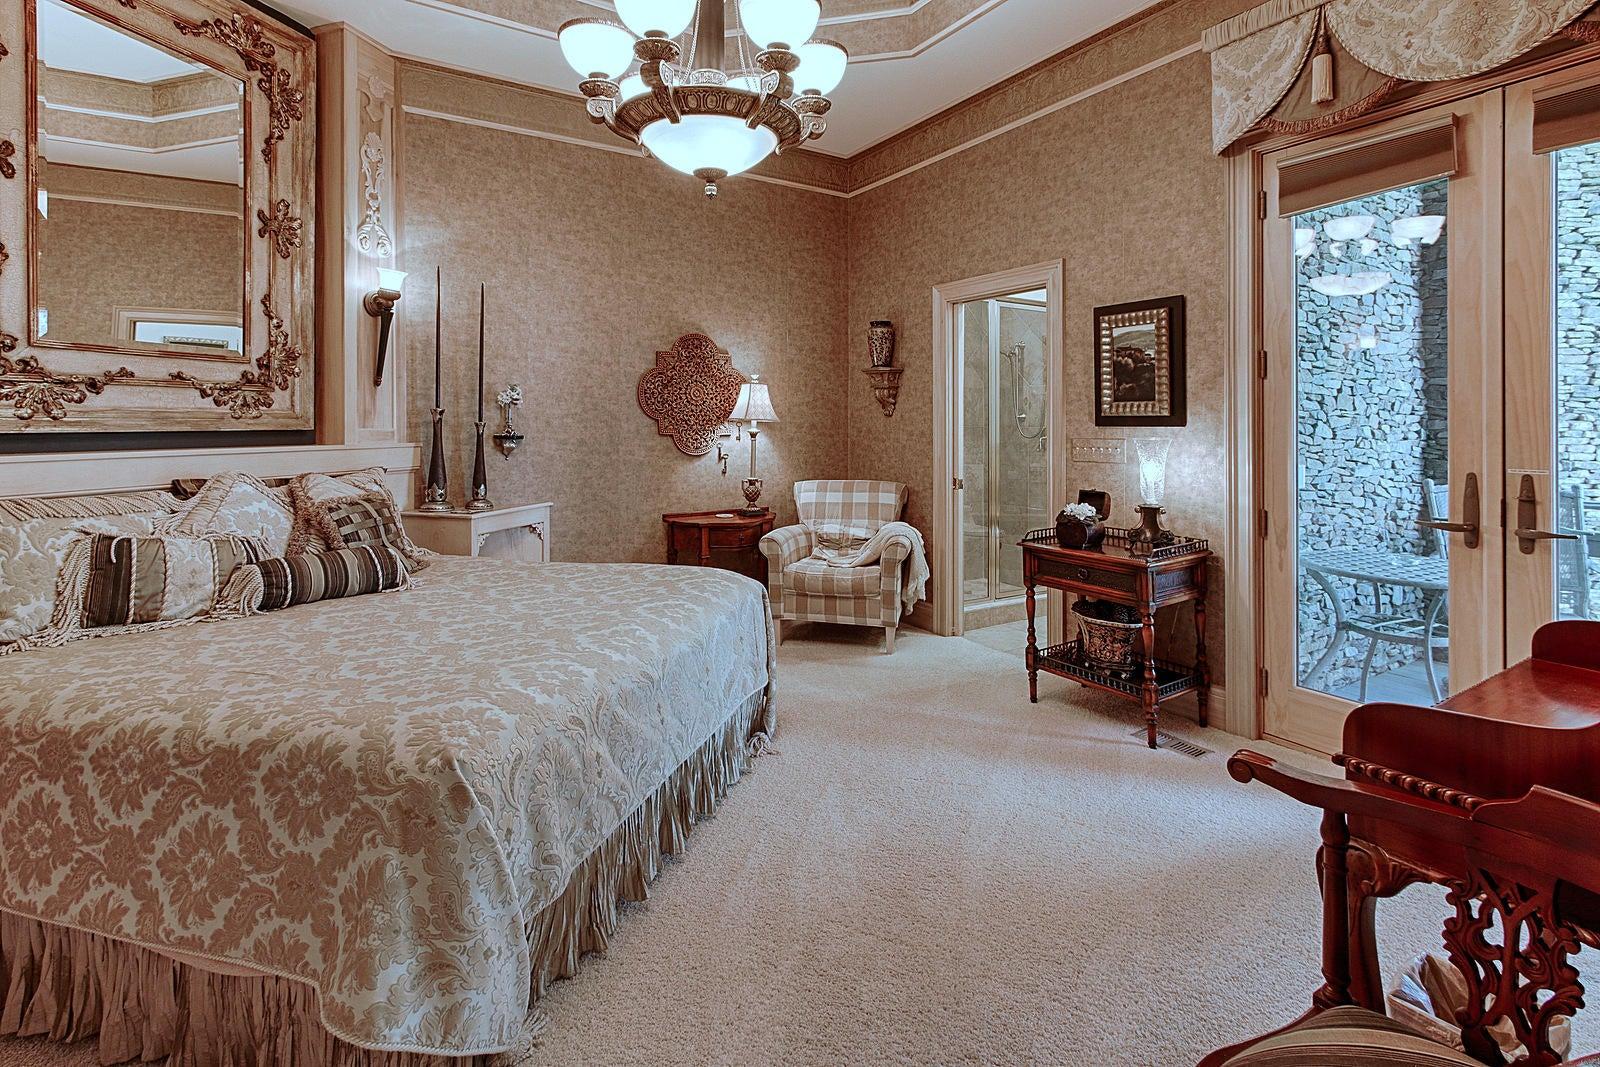 Bedroom 3 has Private Balcony